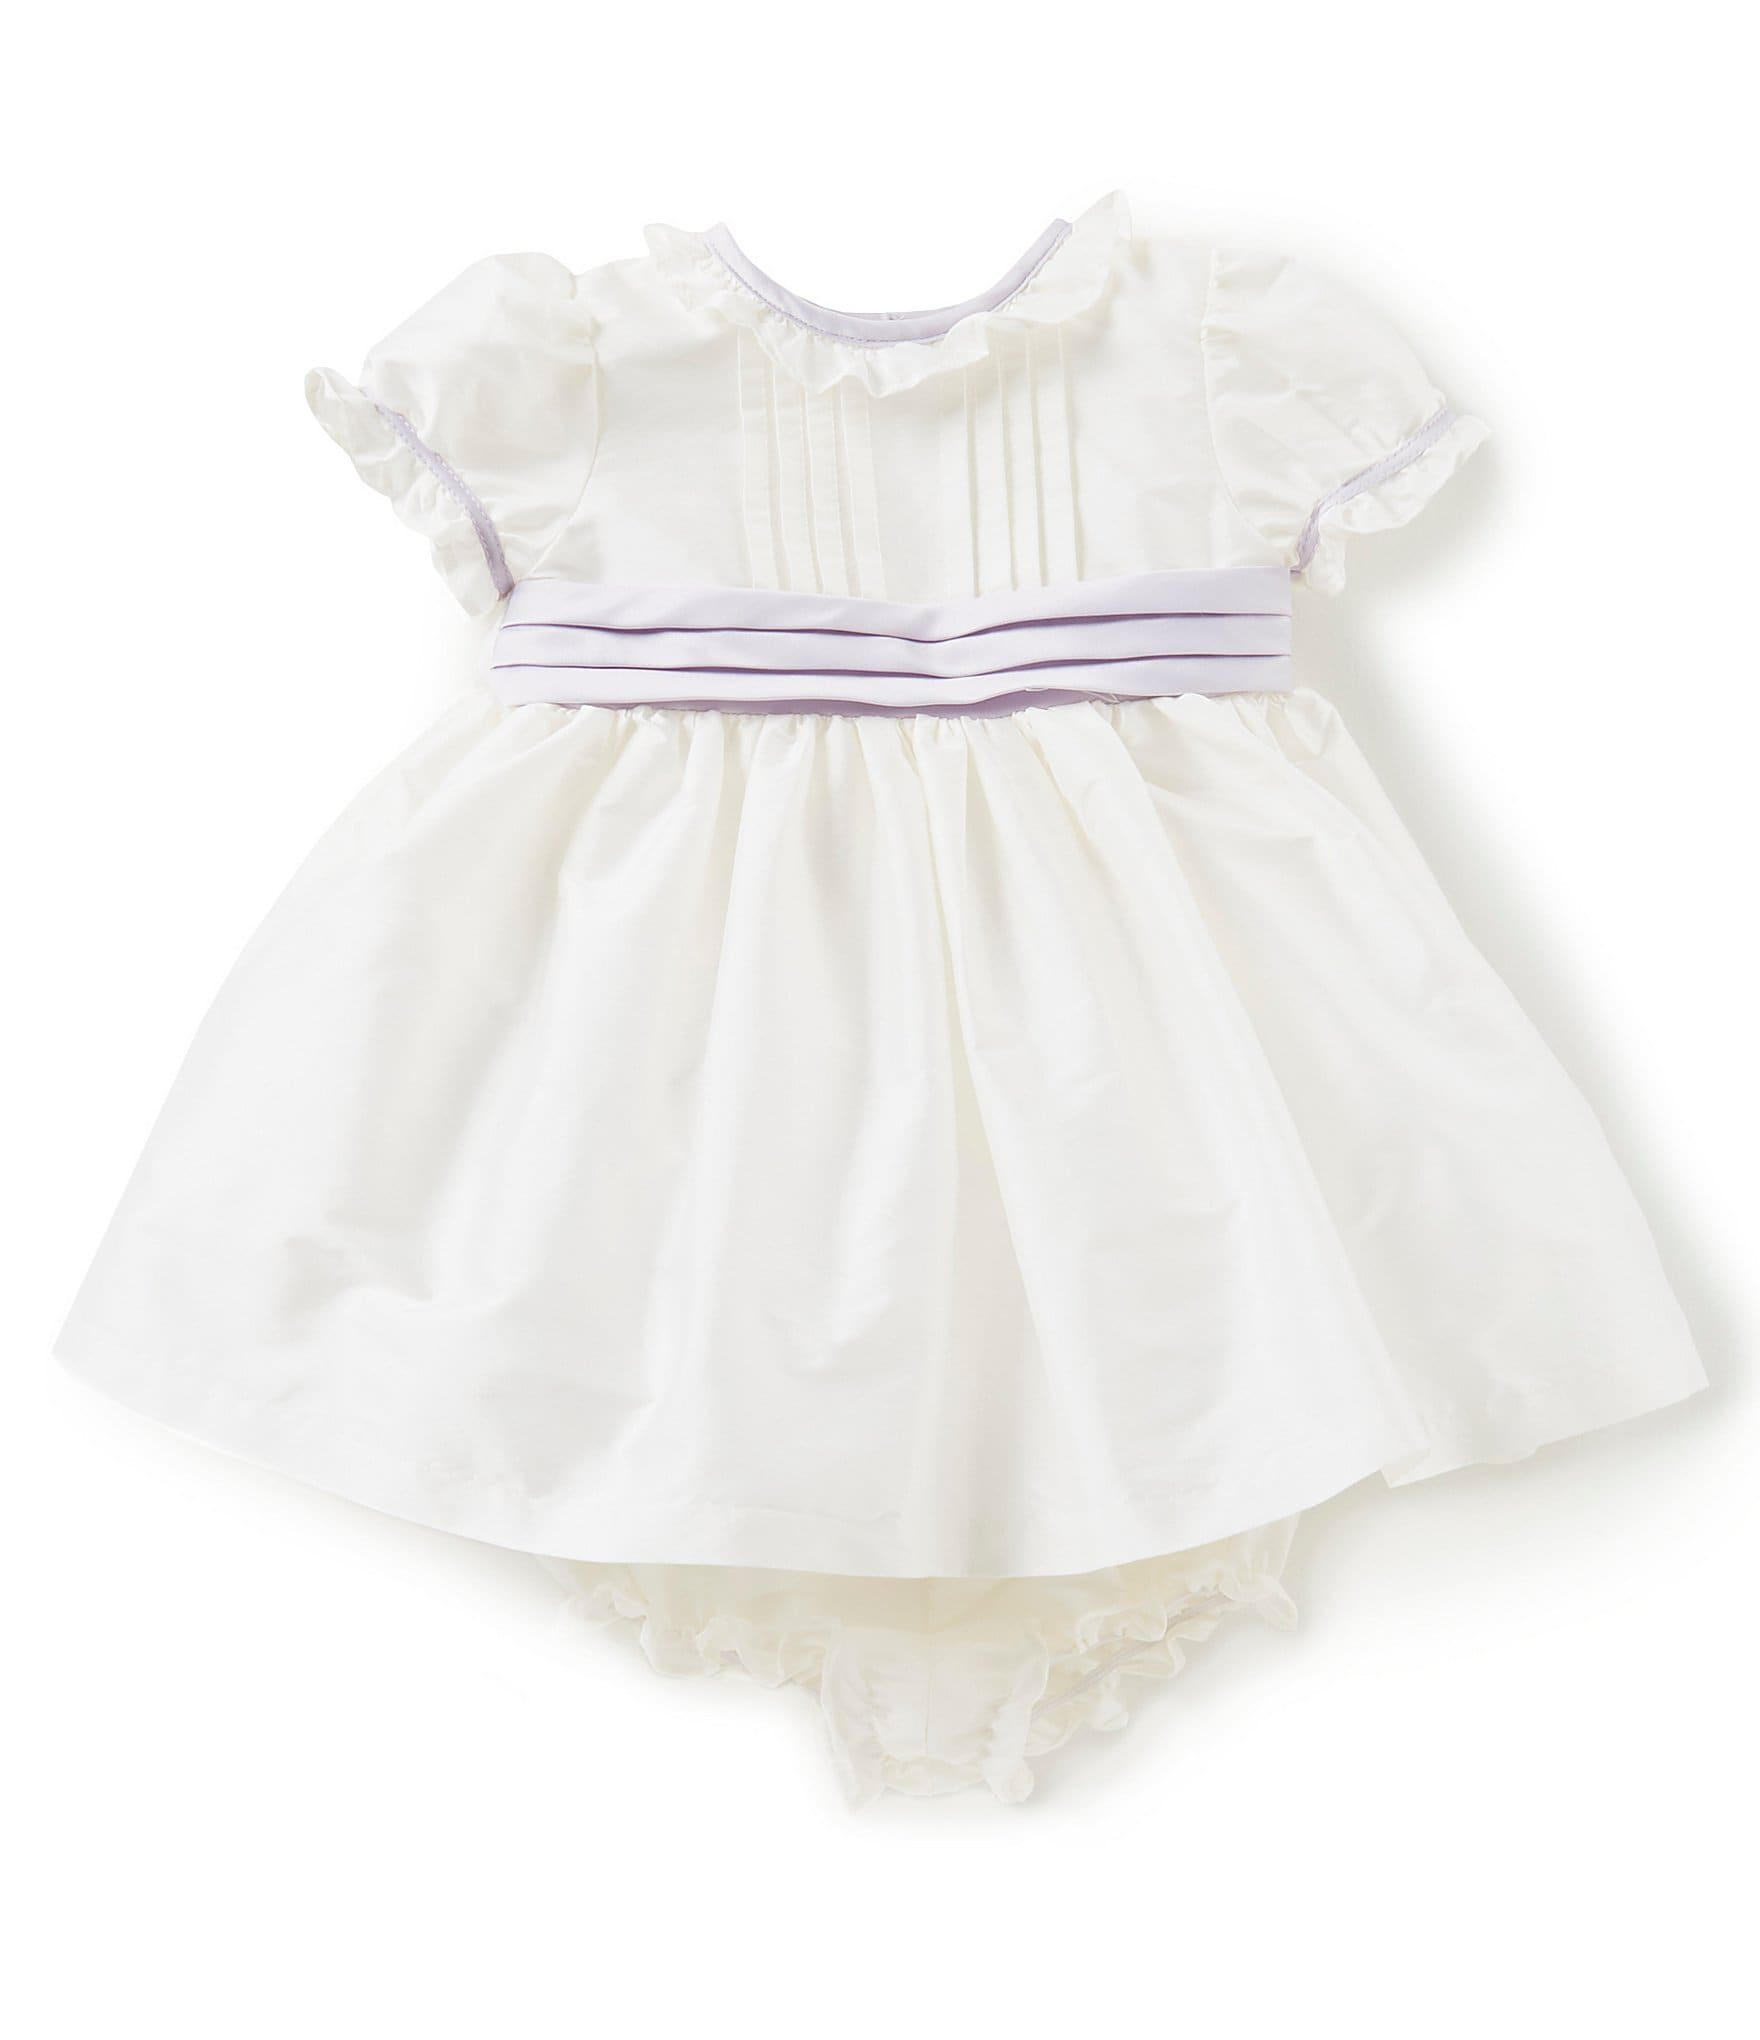 Laura Ashley London Baby Girls Newborn 24 Months Short